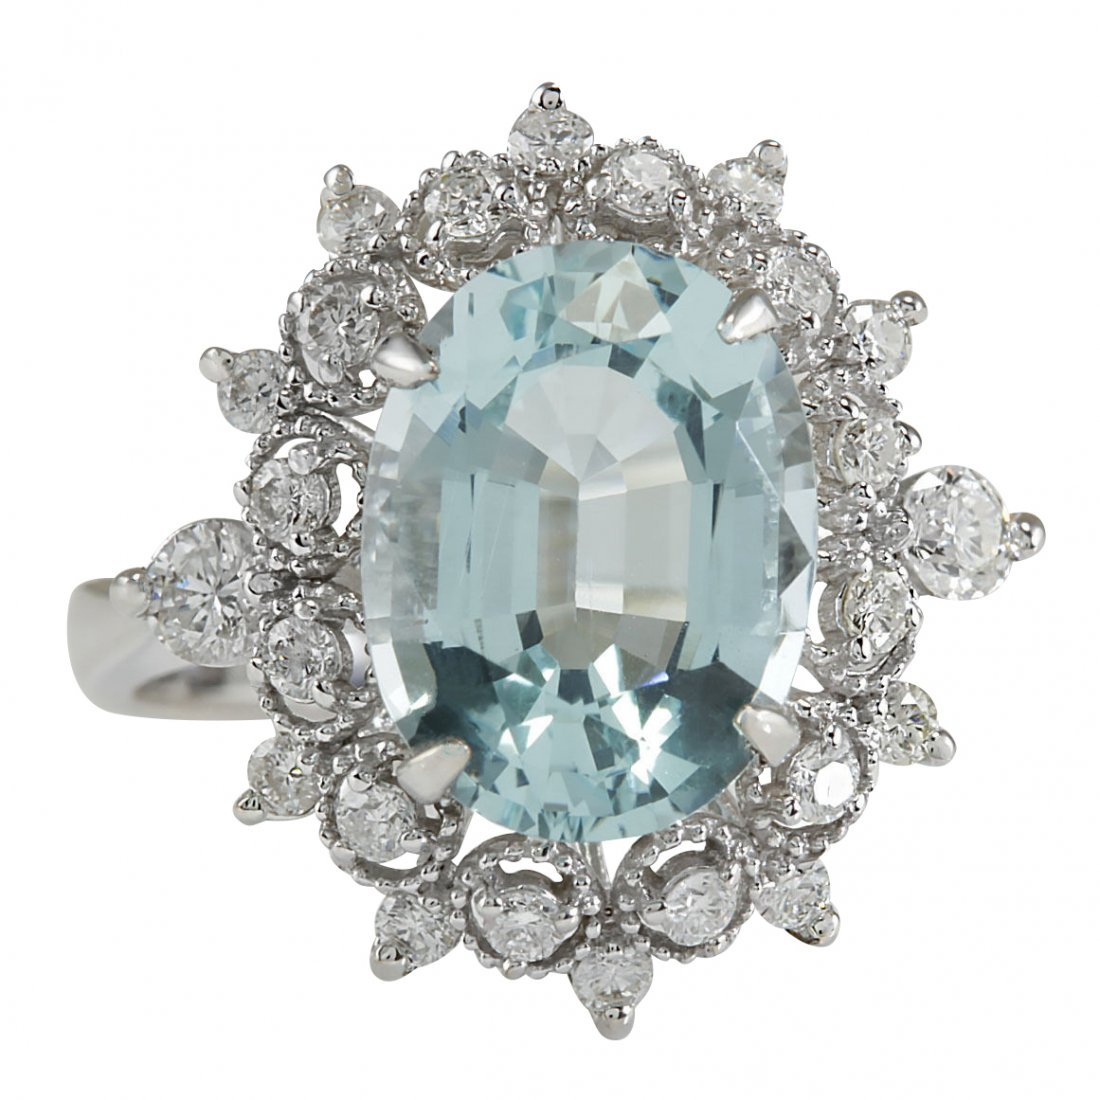 4.48CTW Natural Aquamarine And Diamond Ring In 14K